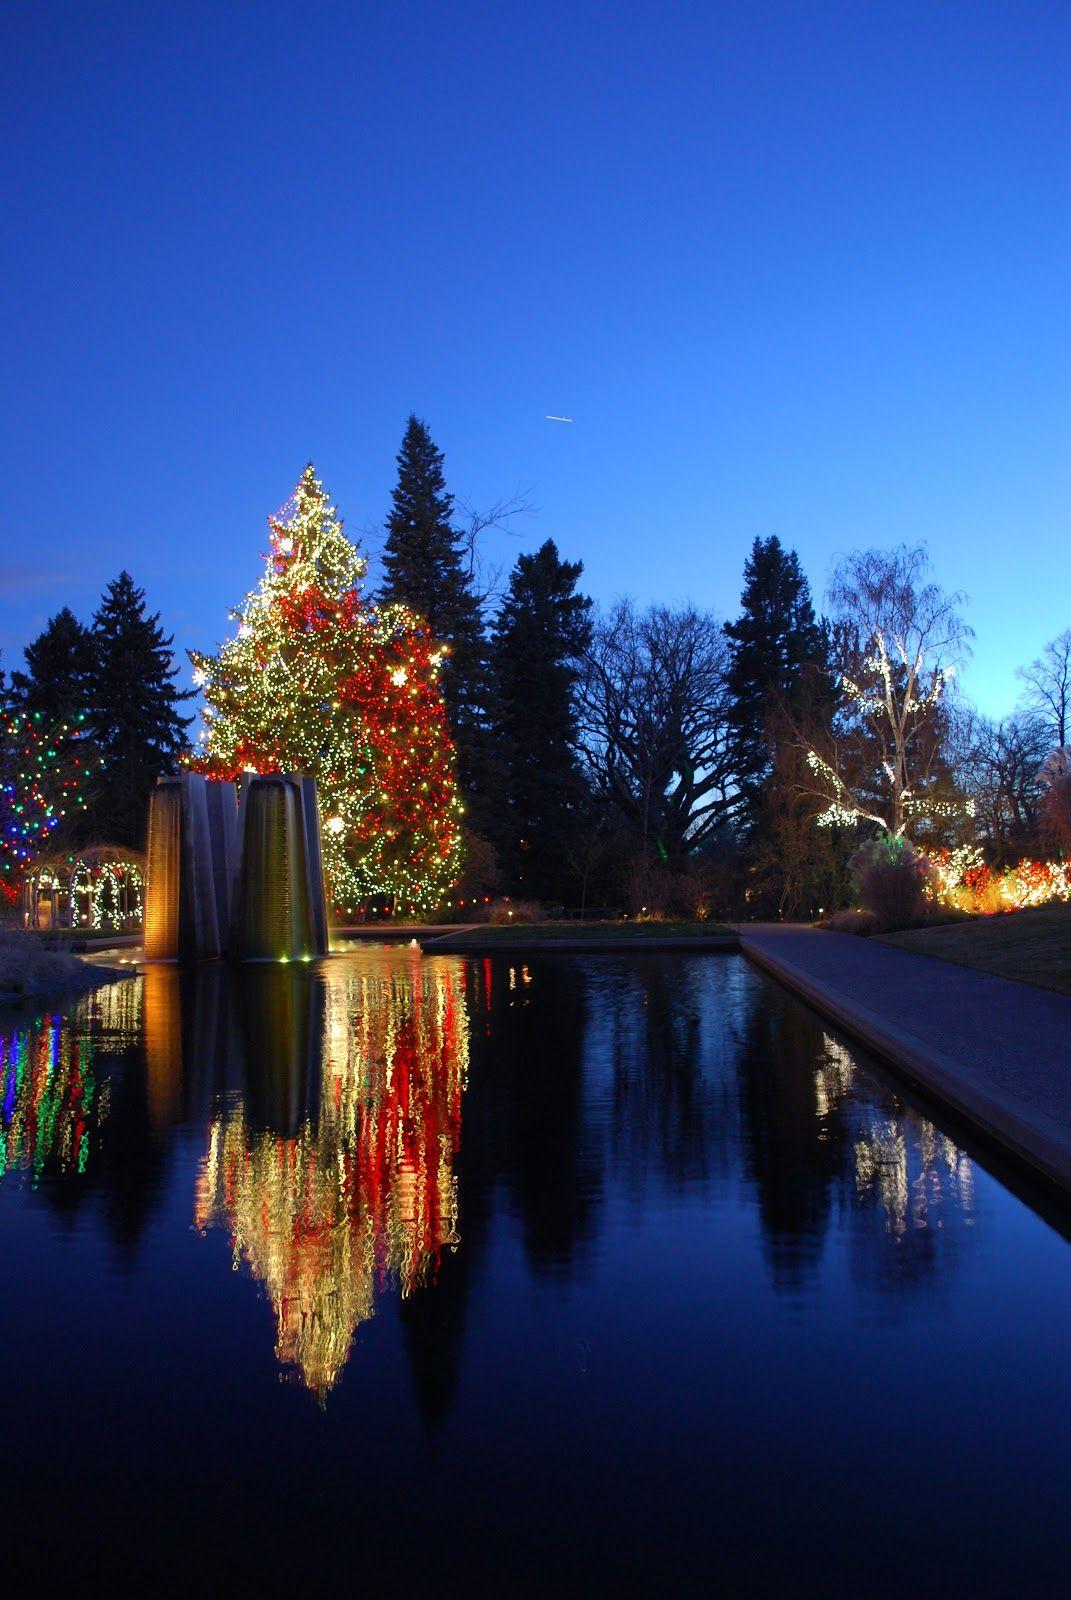 holiday lighting at Denver Botanic Gardens via The Art